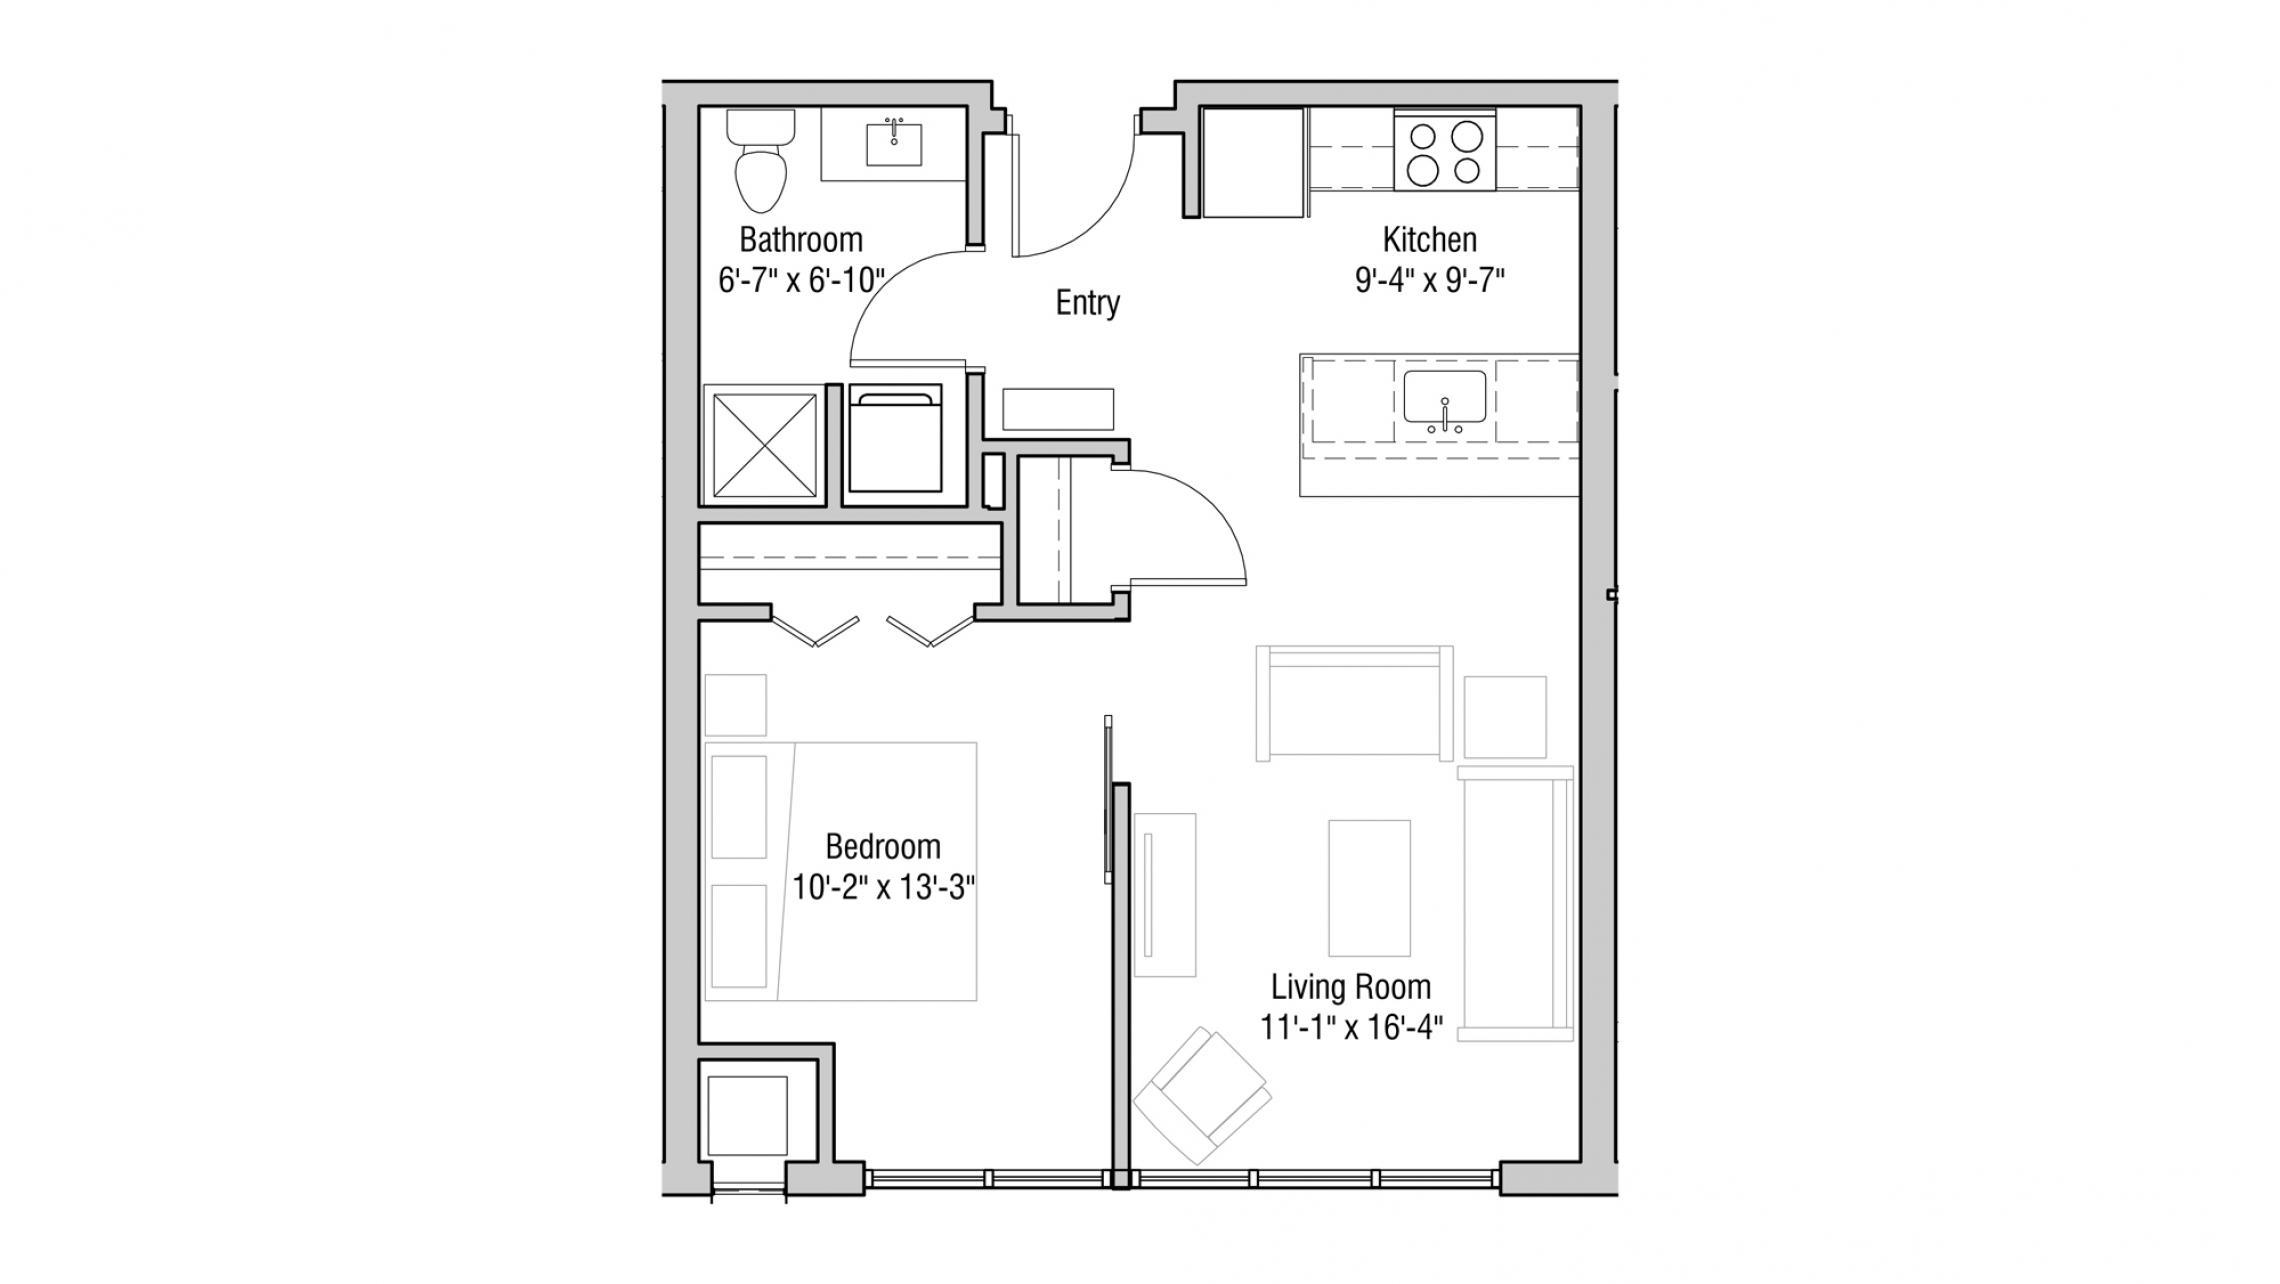 ULI Quarter Row 208 - One Bedroom, One Bathroom